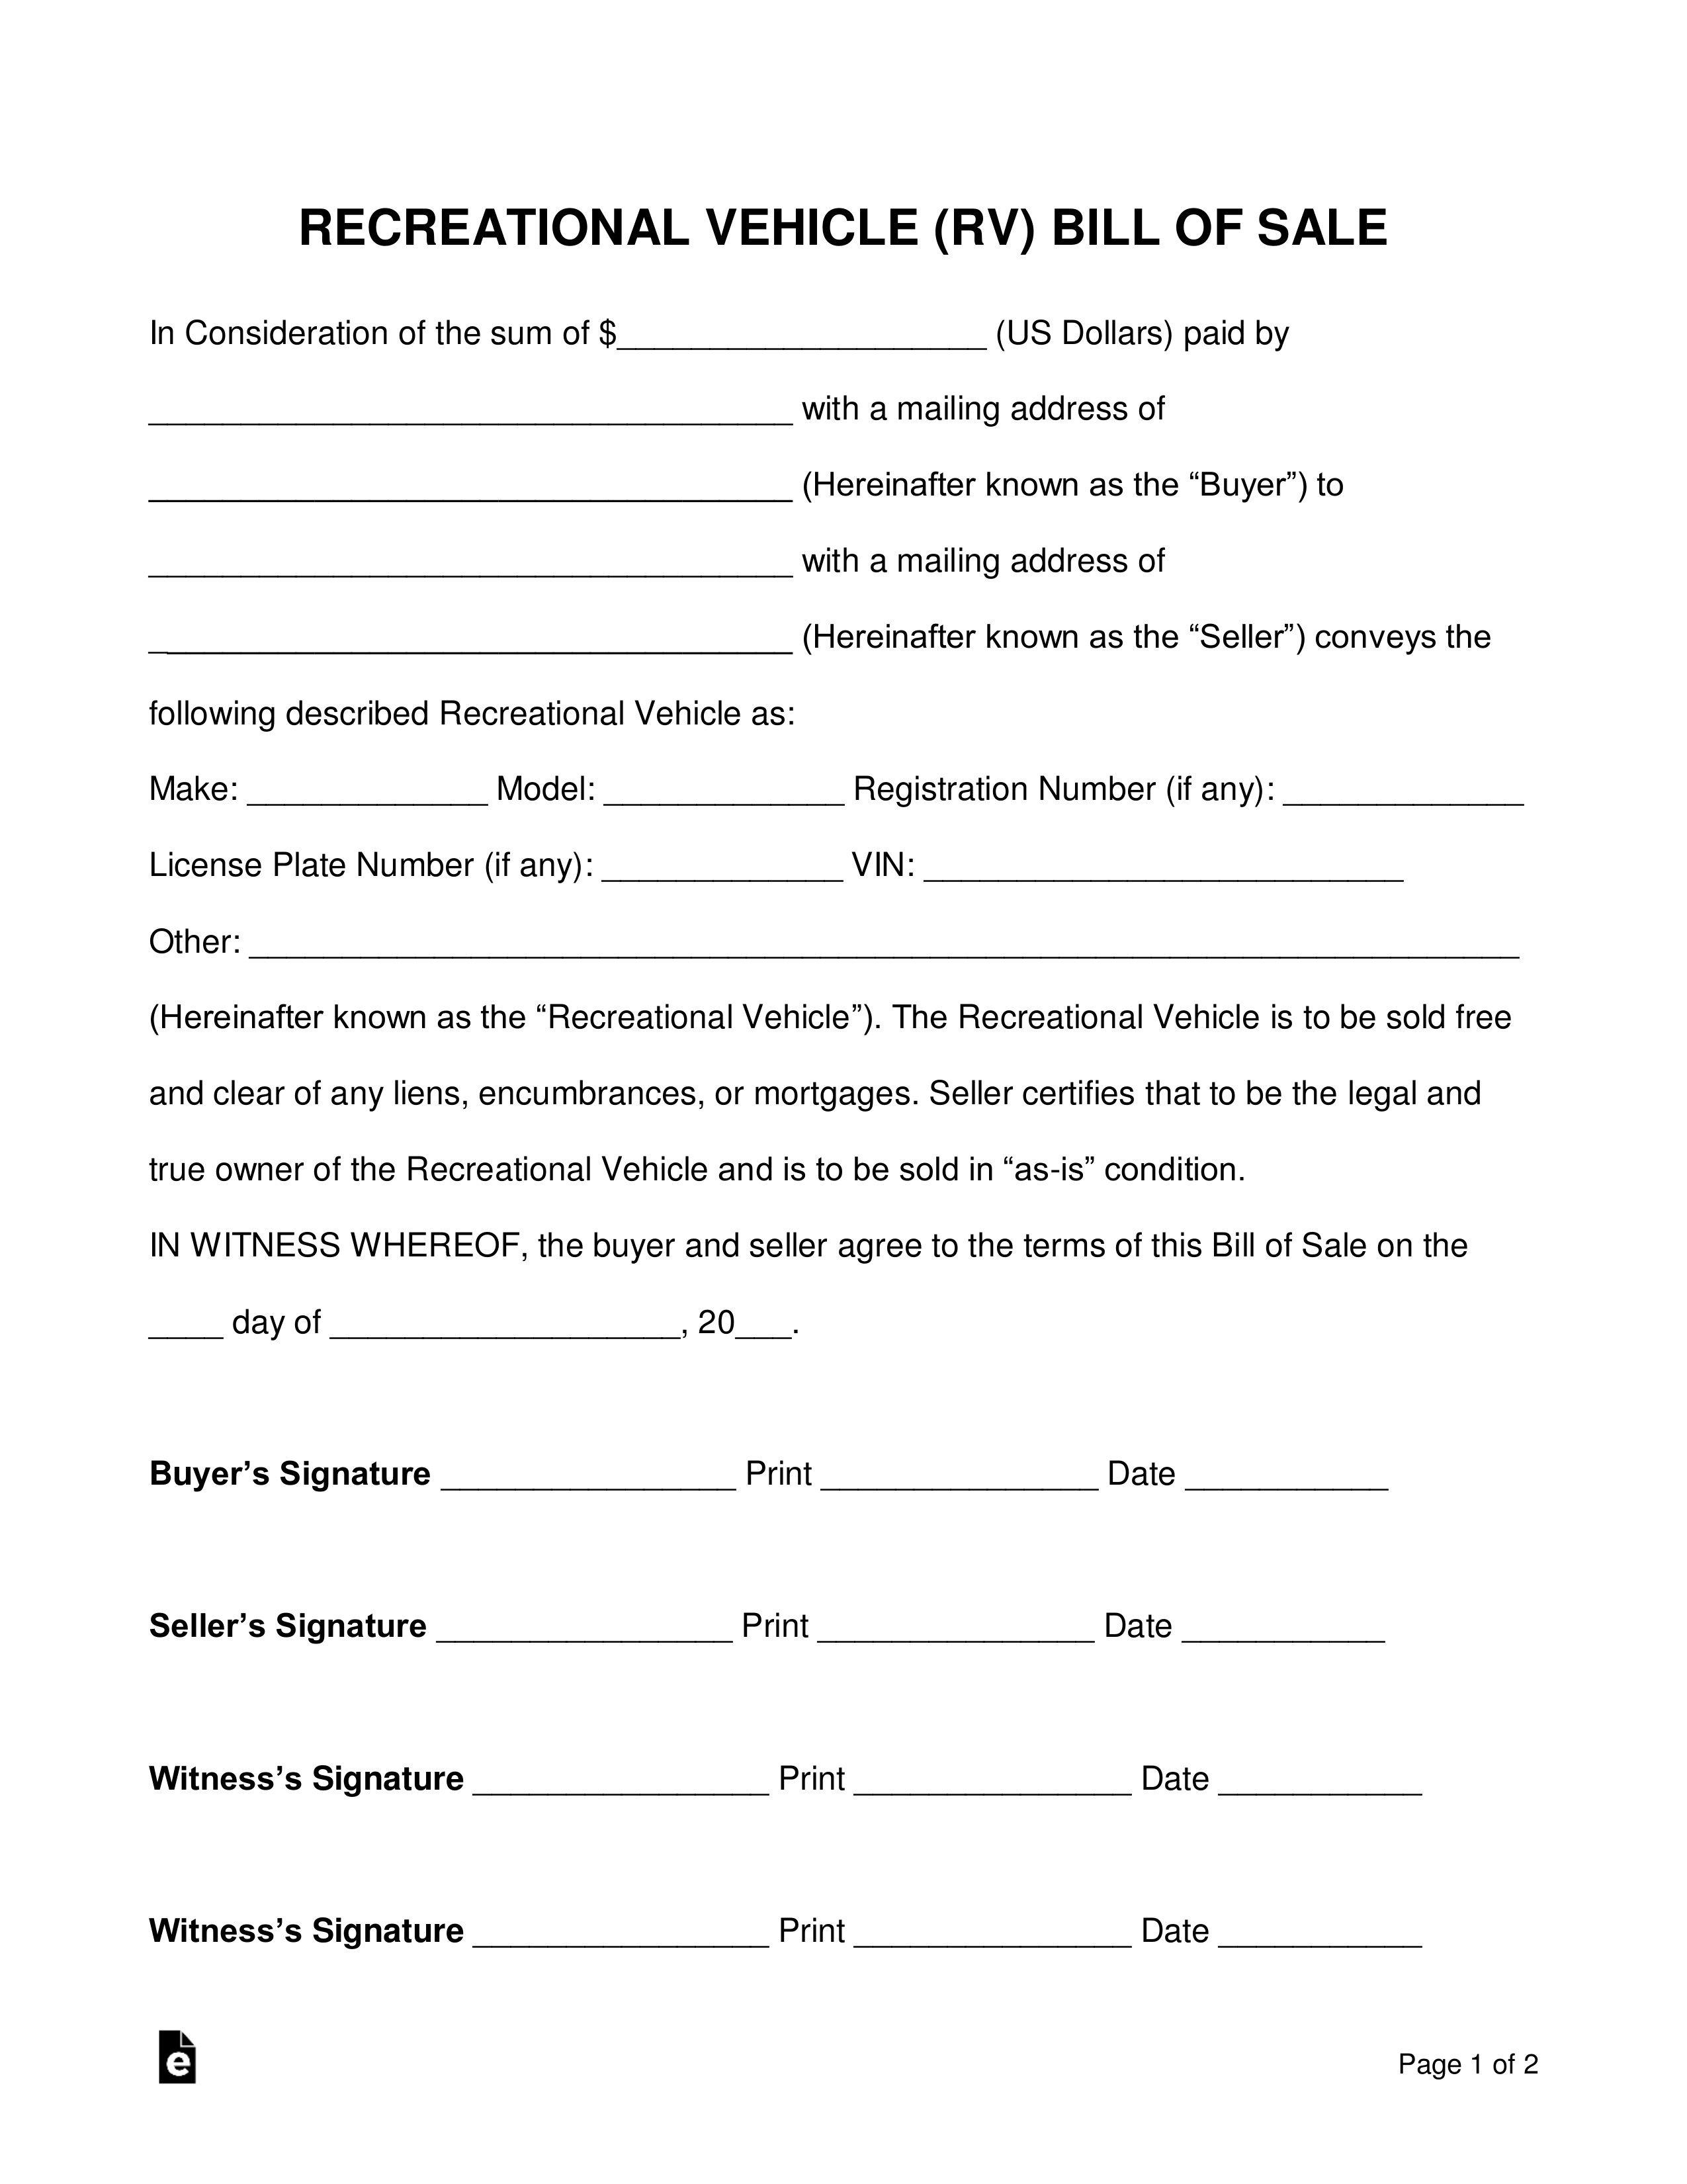 005 Frightening Bill Of Sale Template Texa Design  Texas Free Car Form Dmv DocumentFull